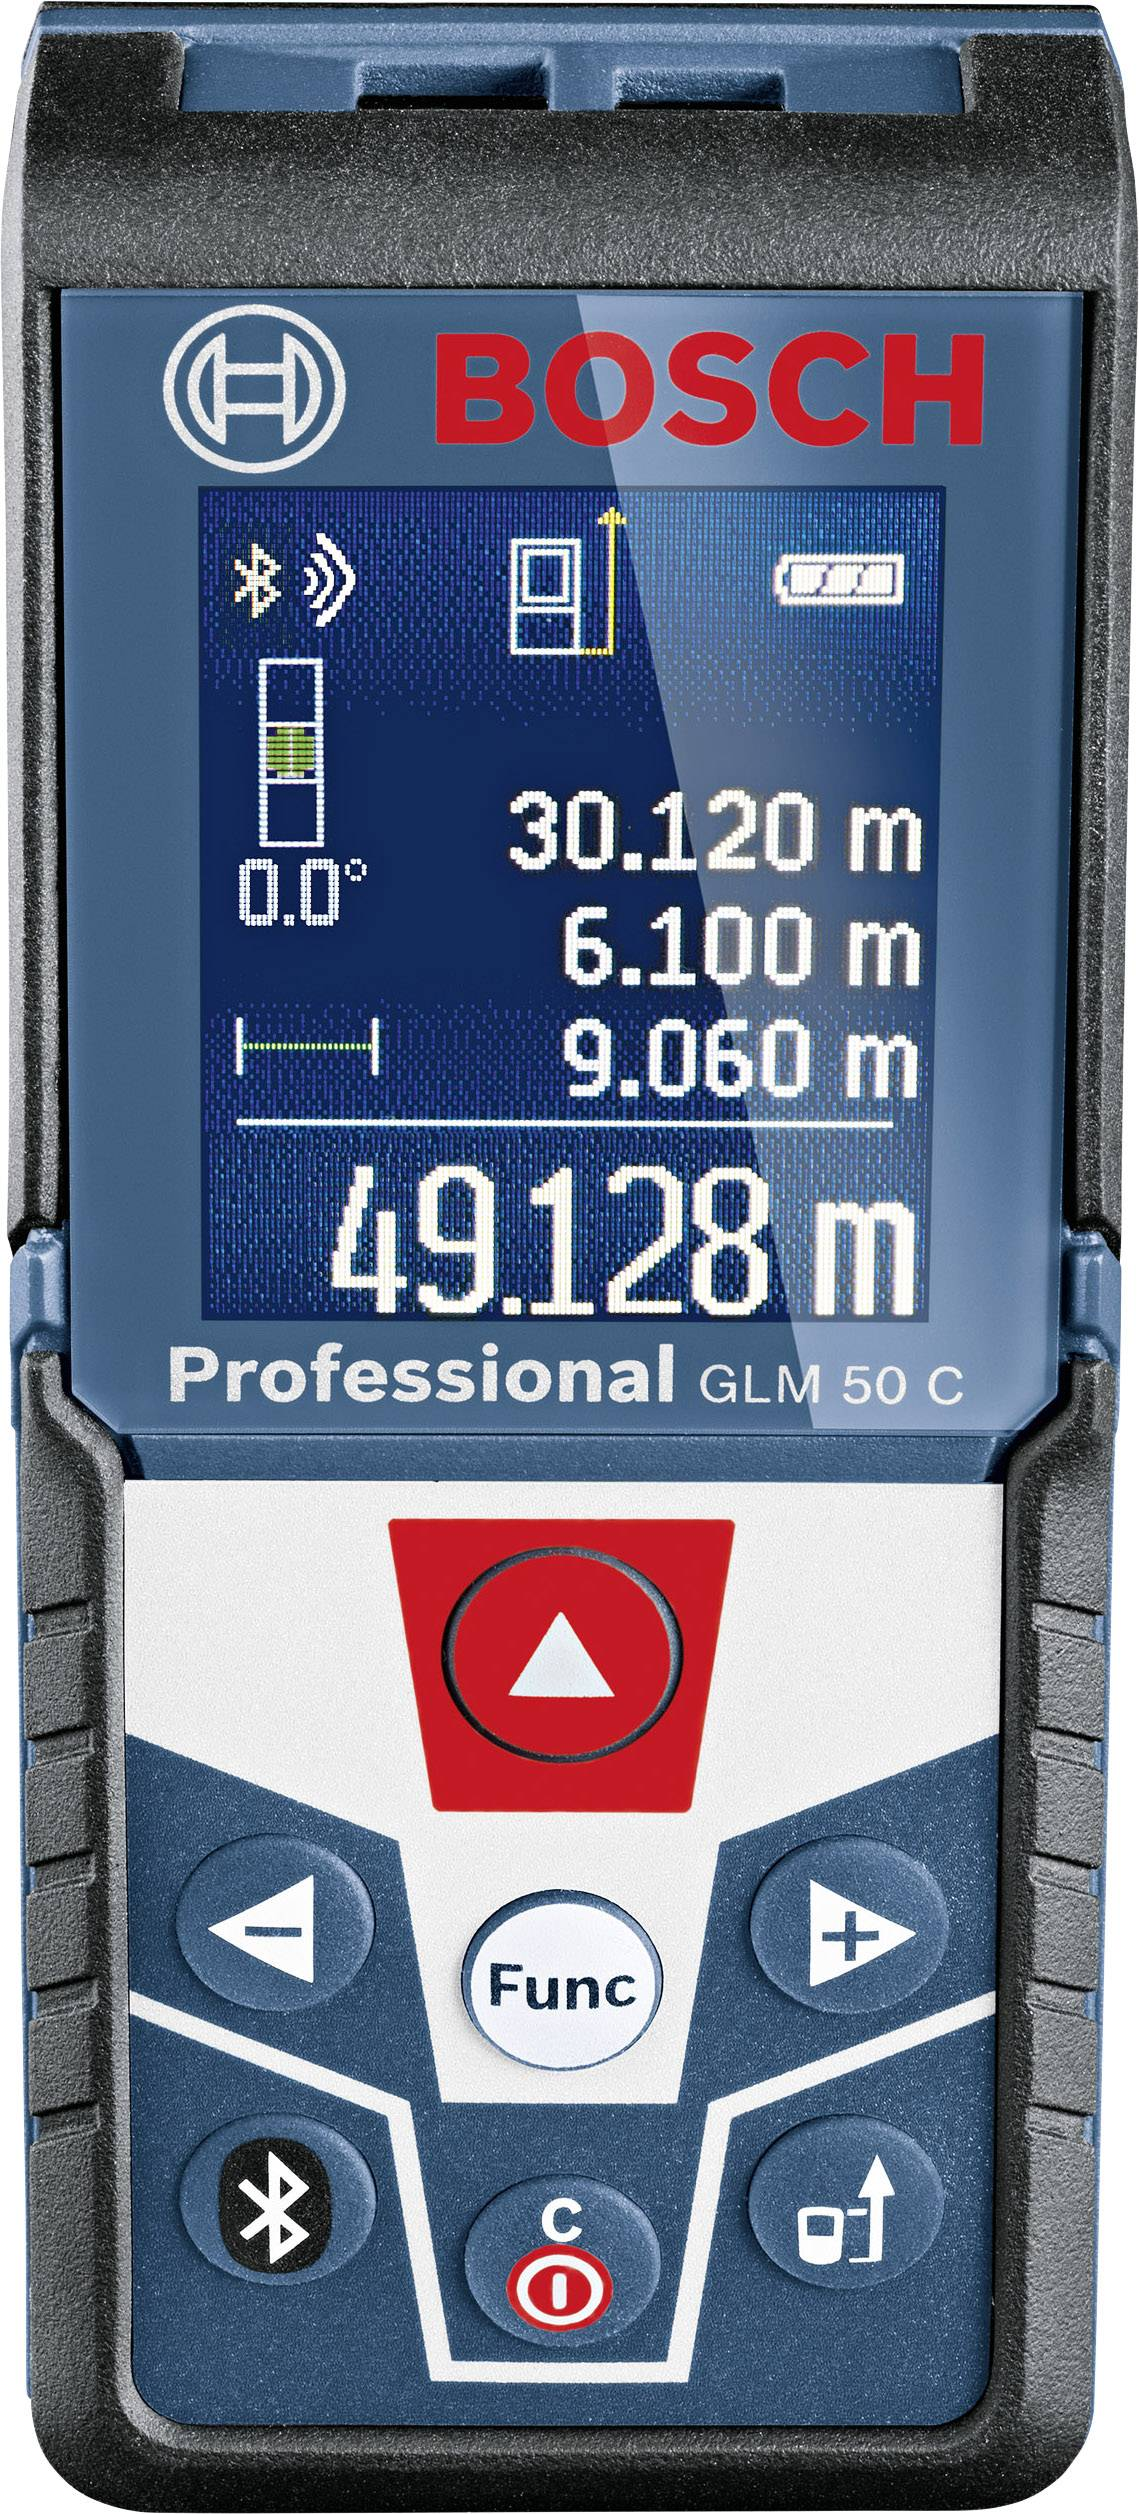 Bosch Professional Laser Measure GLM 50 C Bosch Professional Tripod BT 150